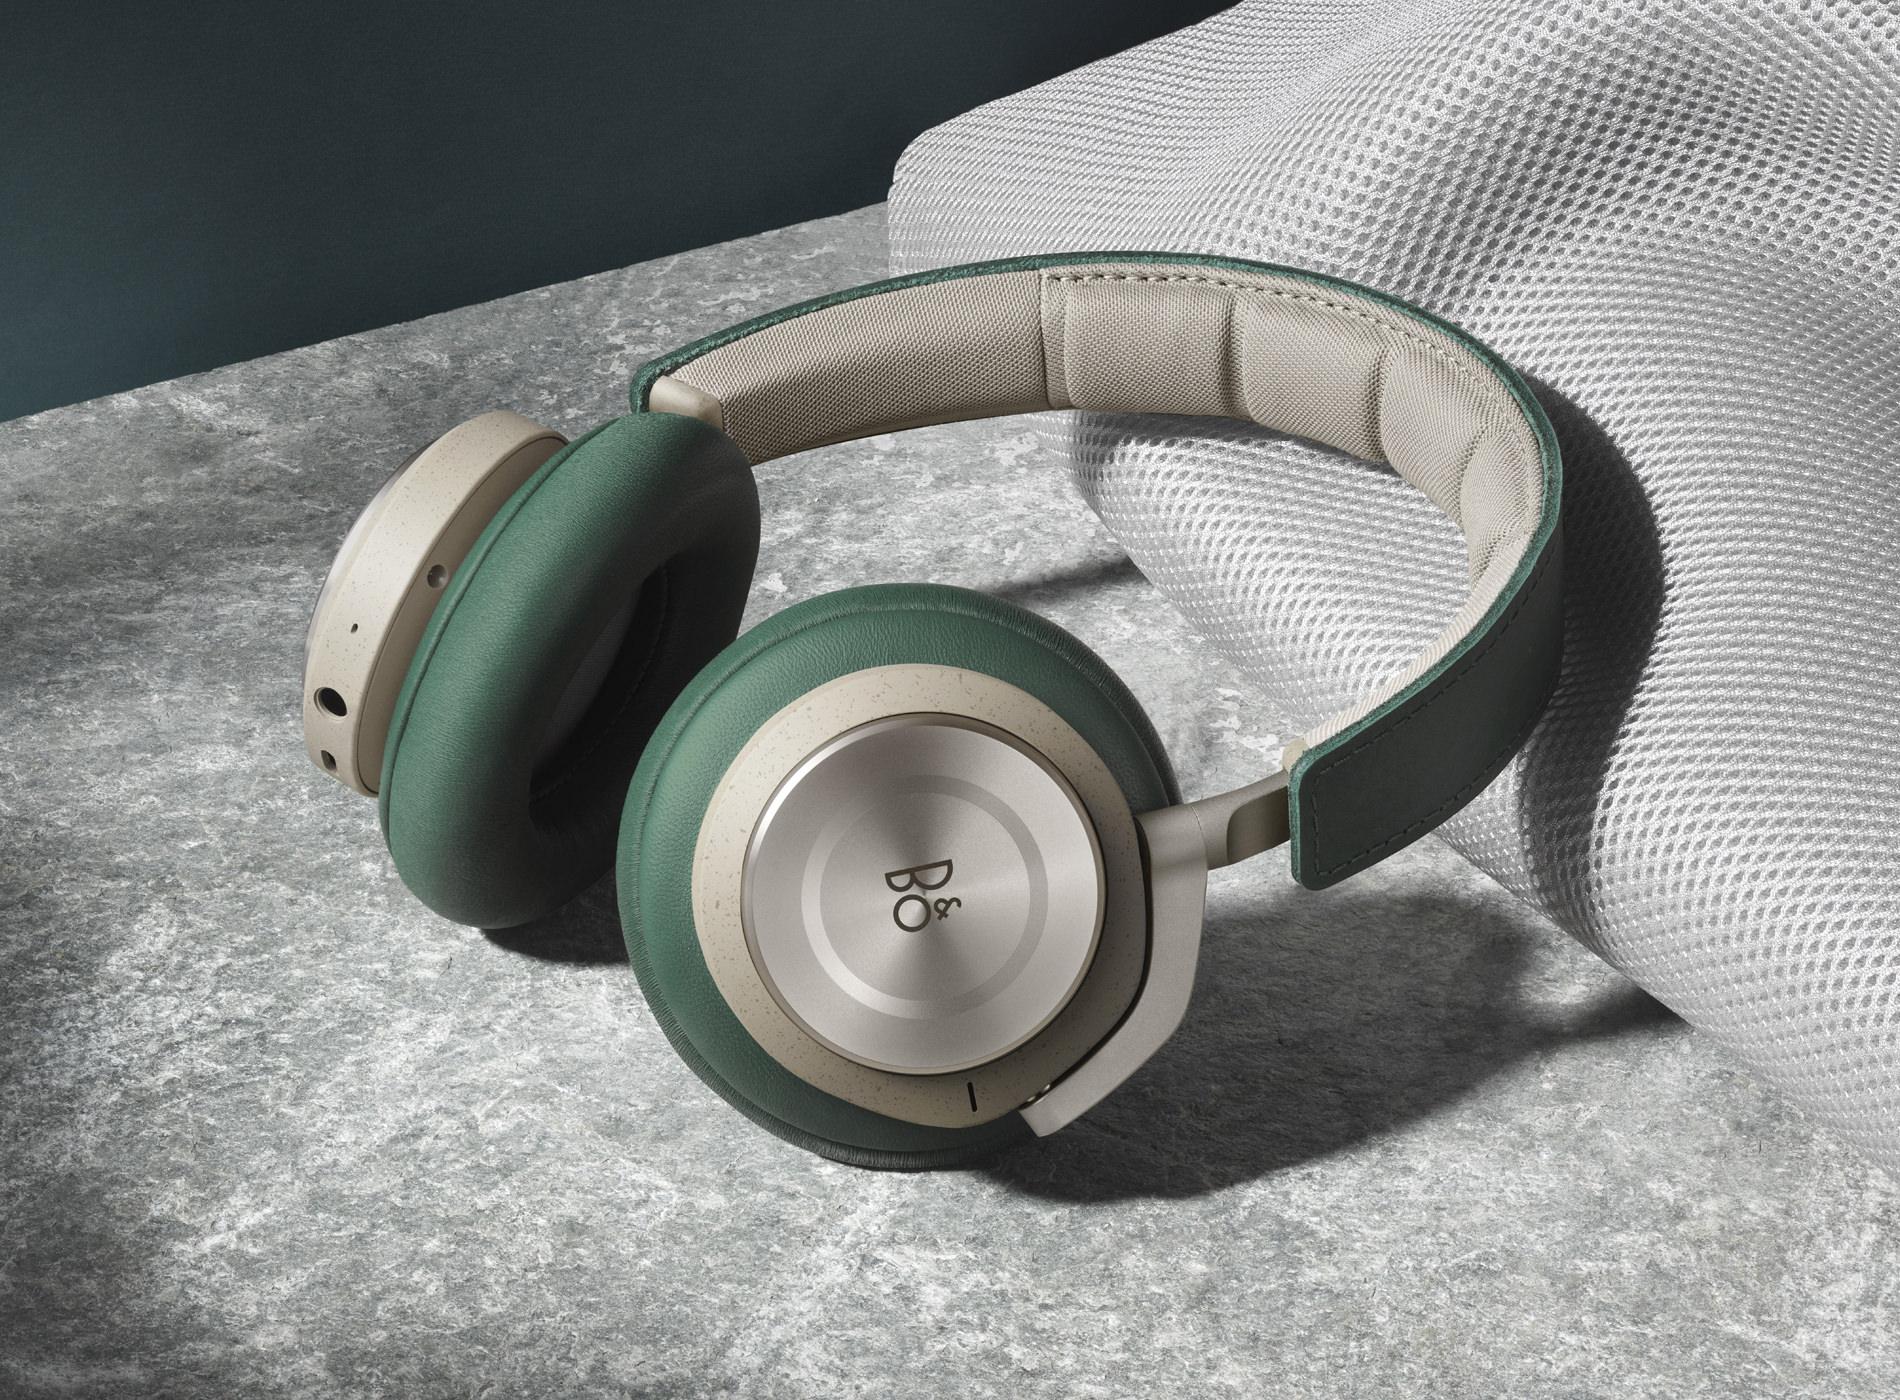 Lifestyle Bang & Olufsen Casque Haut Parleur Audio Collection SS19 Pine